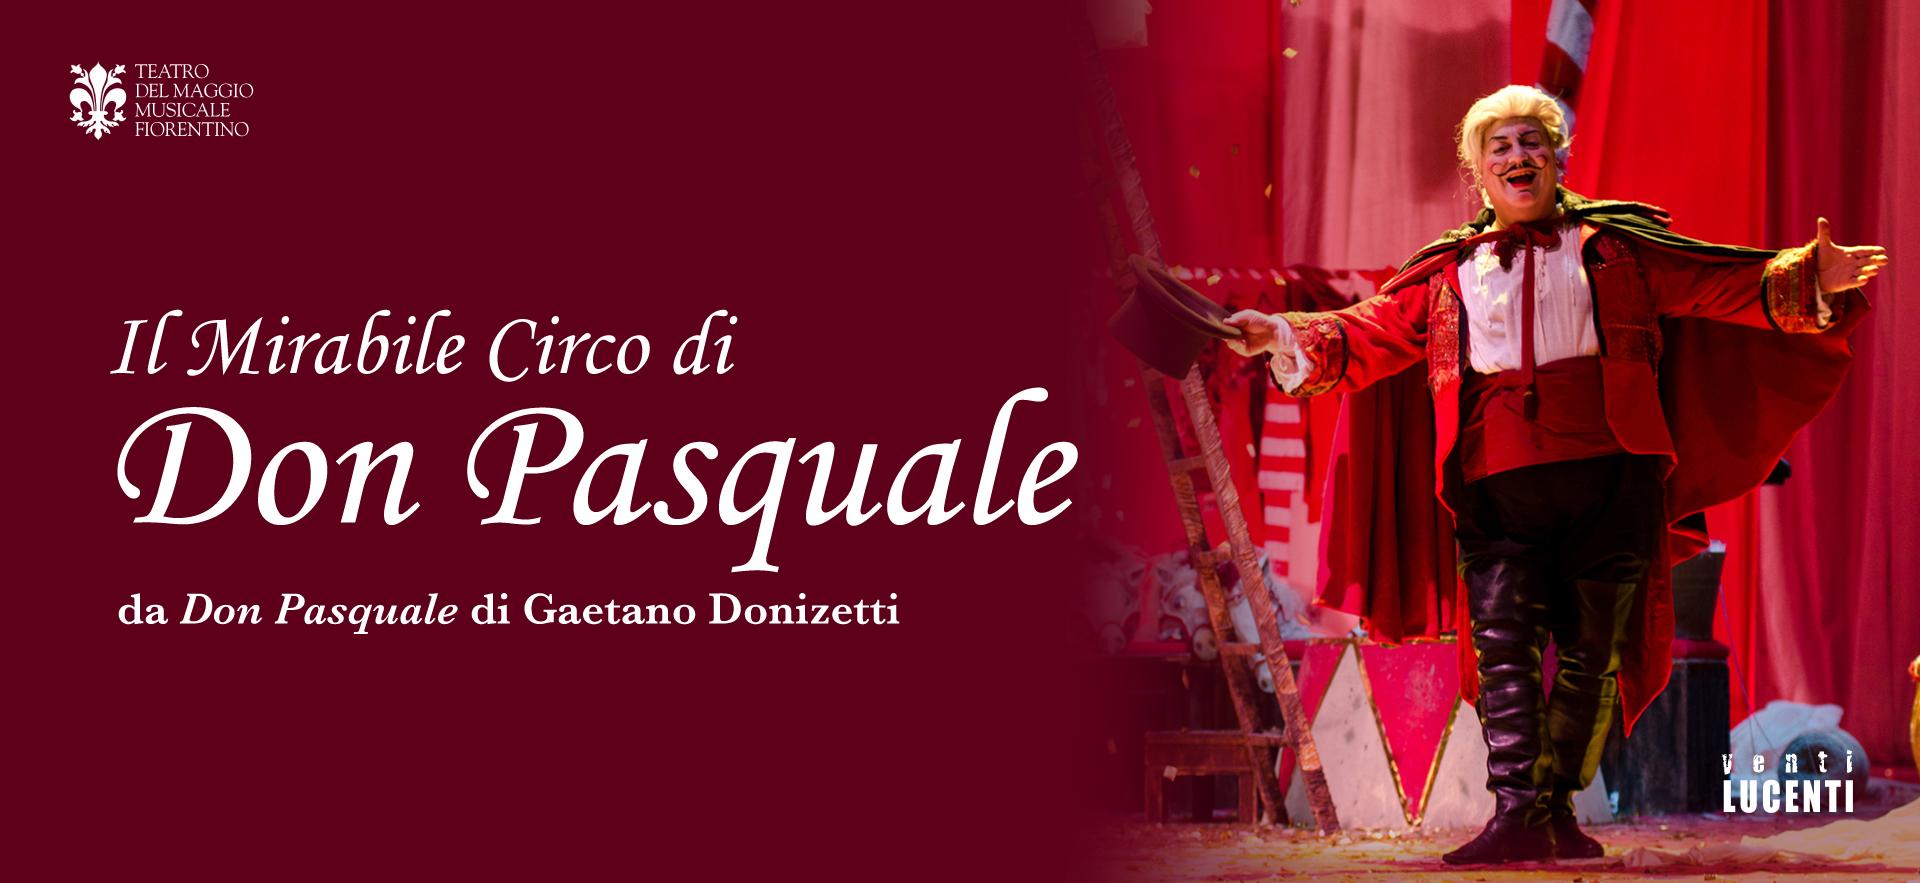 Don Pasquale 2011